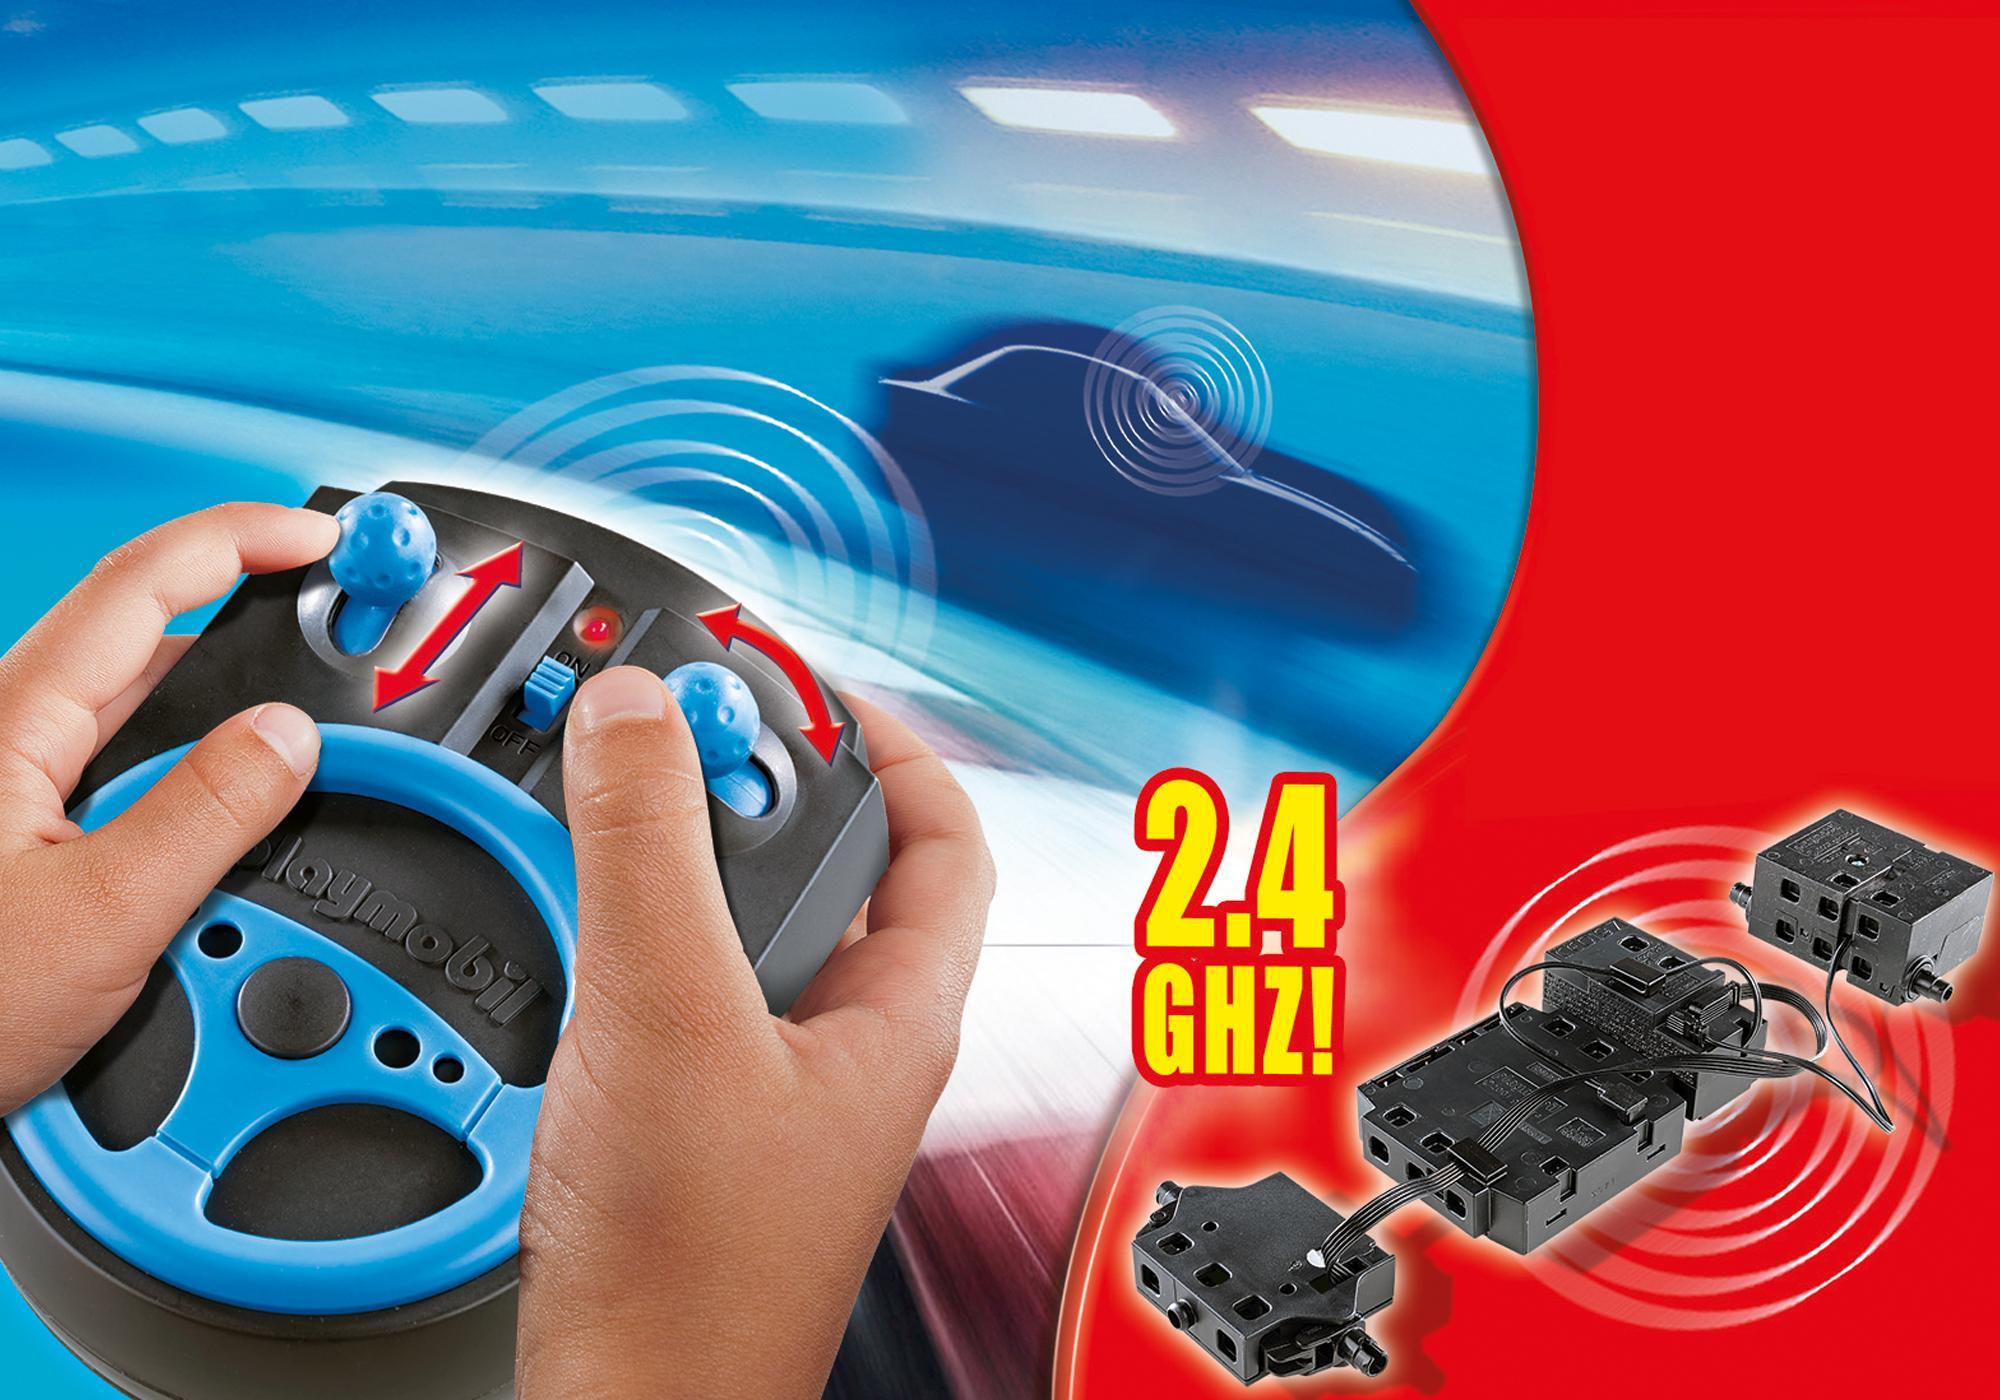 http://media.playmobil.com/i/playmobil/6914_product_detail/Module de radiocommande 2,4 GHz